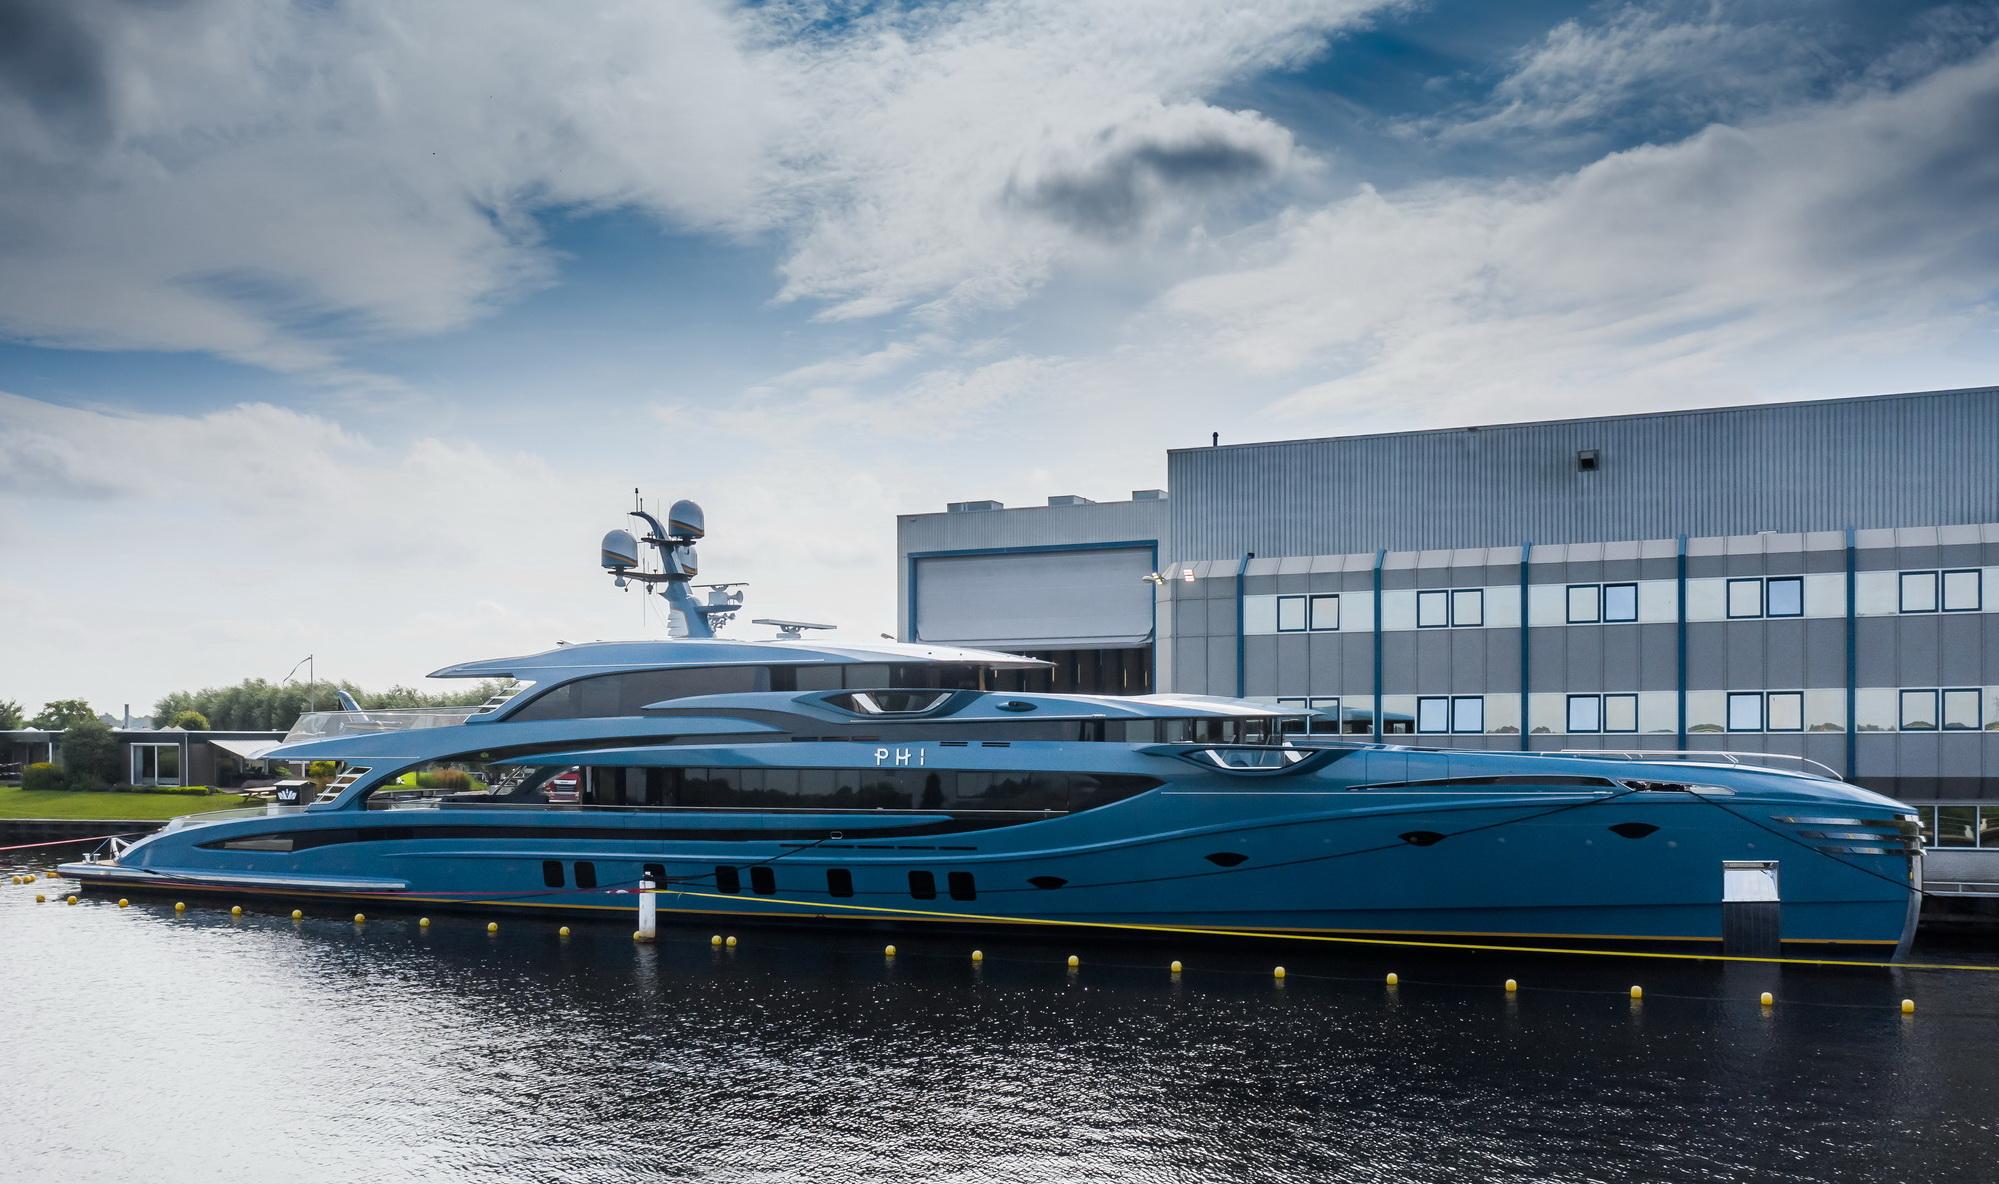 Royal Huisman's project PHI set into water